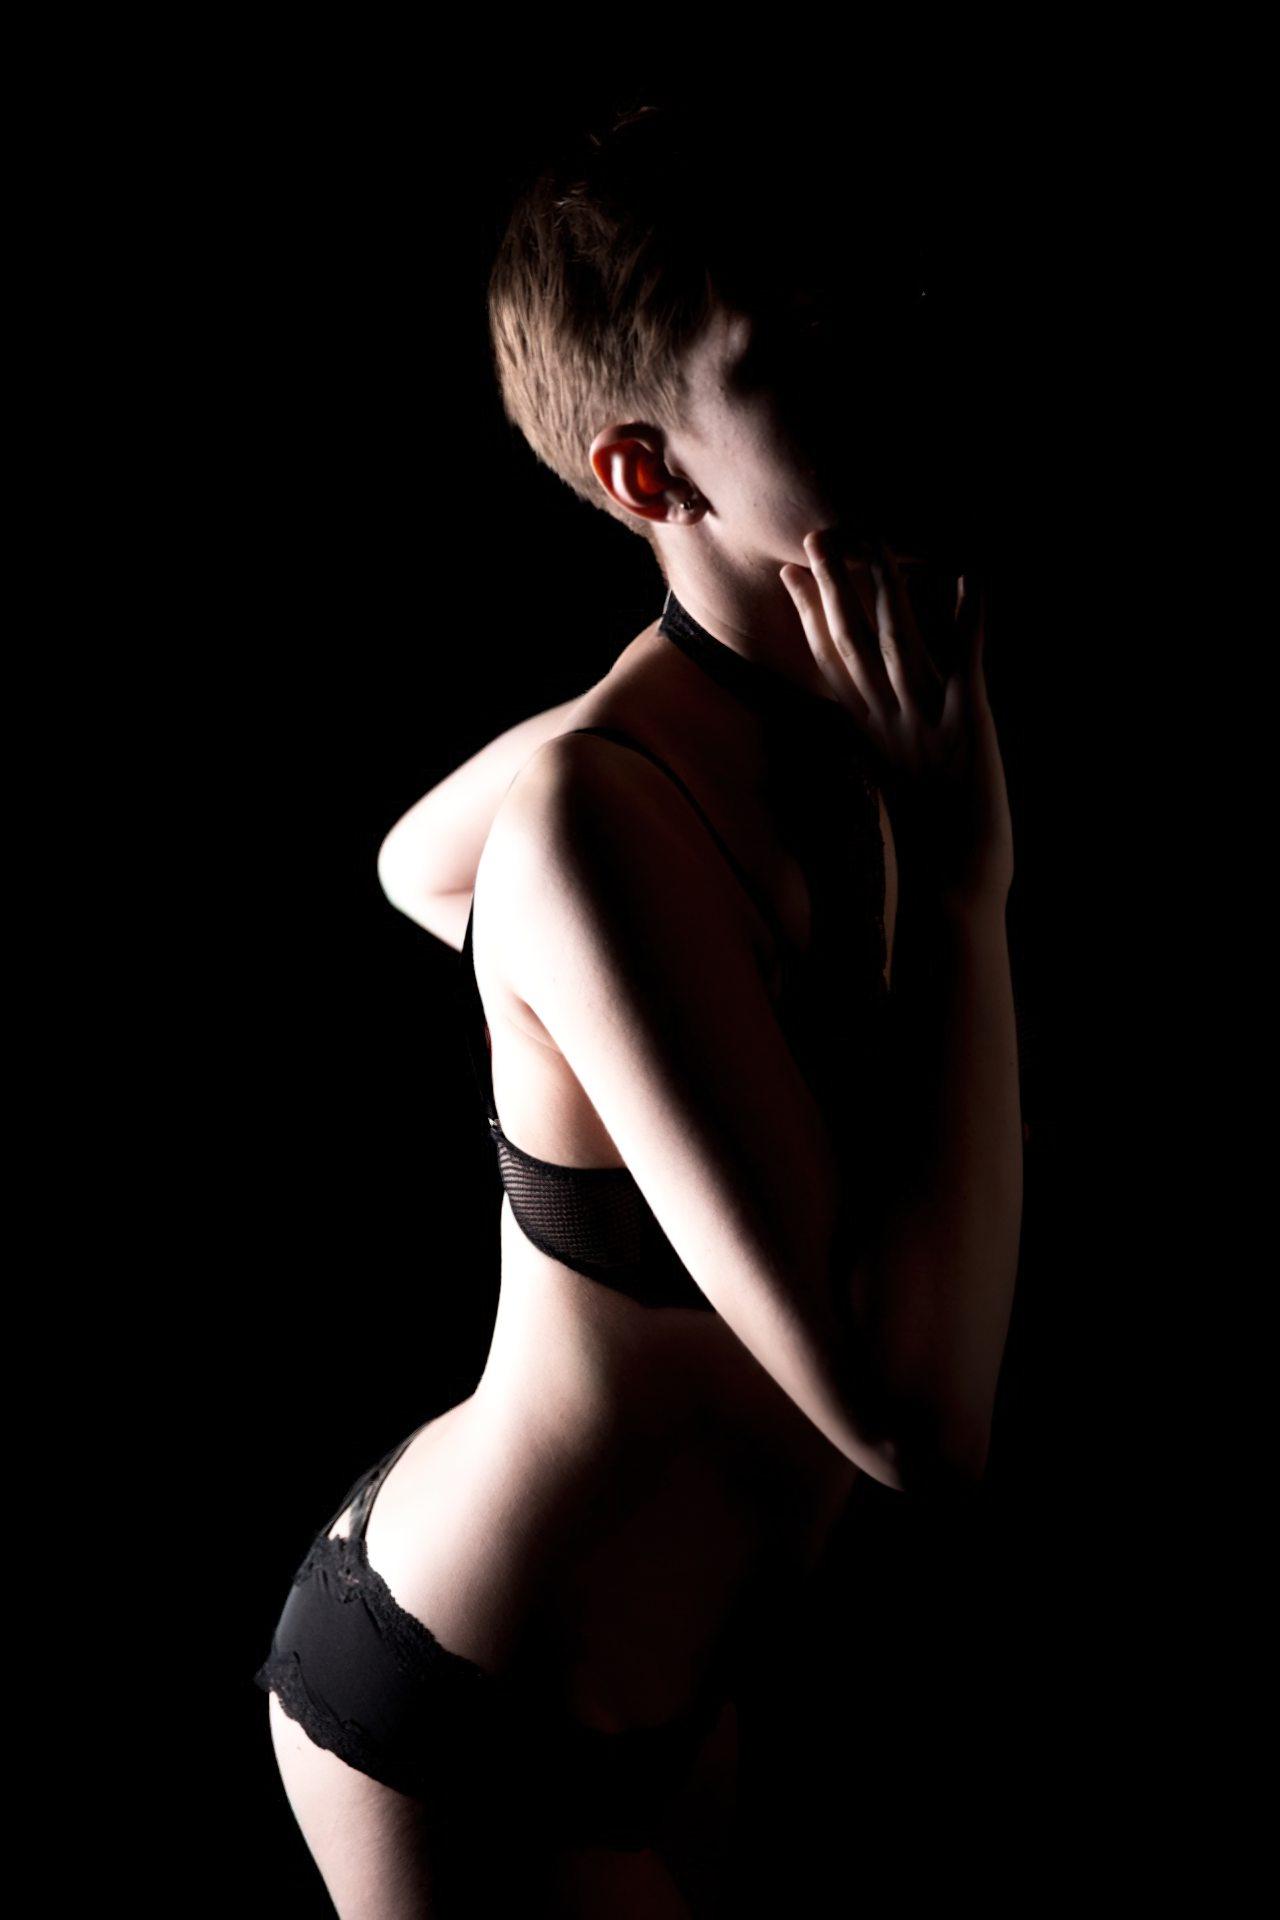 Fotos Mulher Bisexual (5)